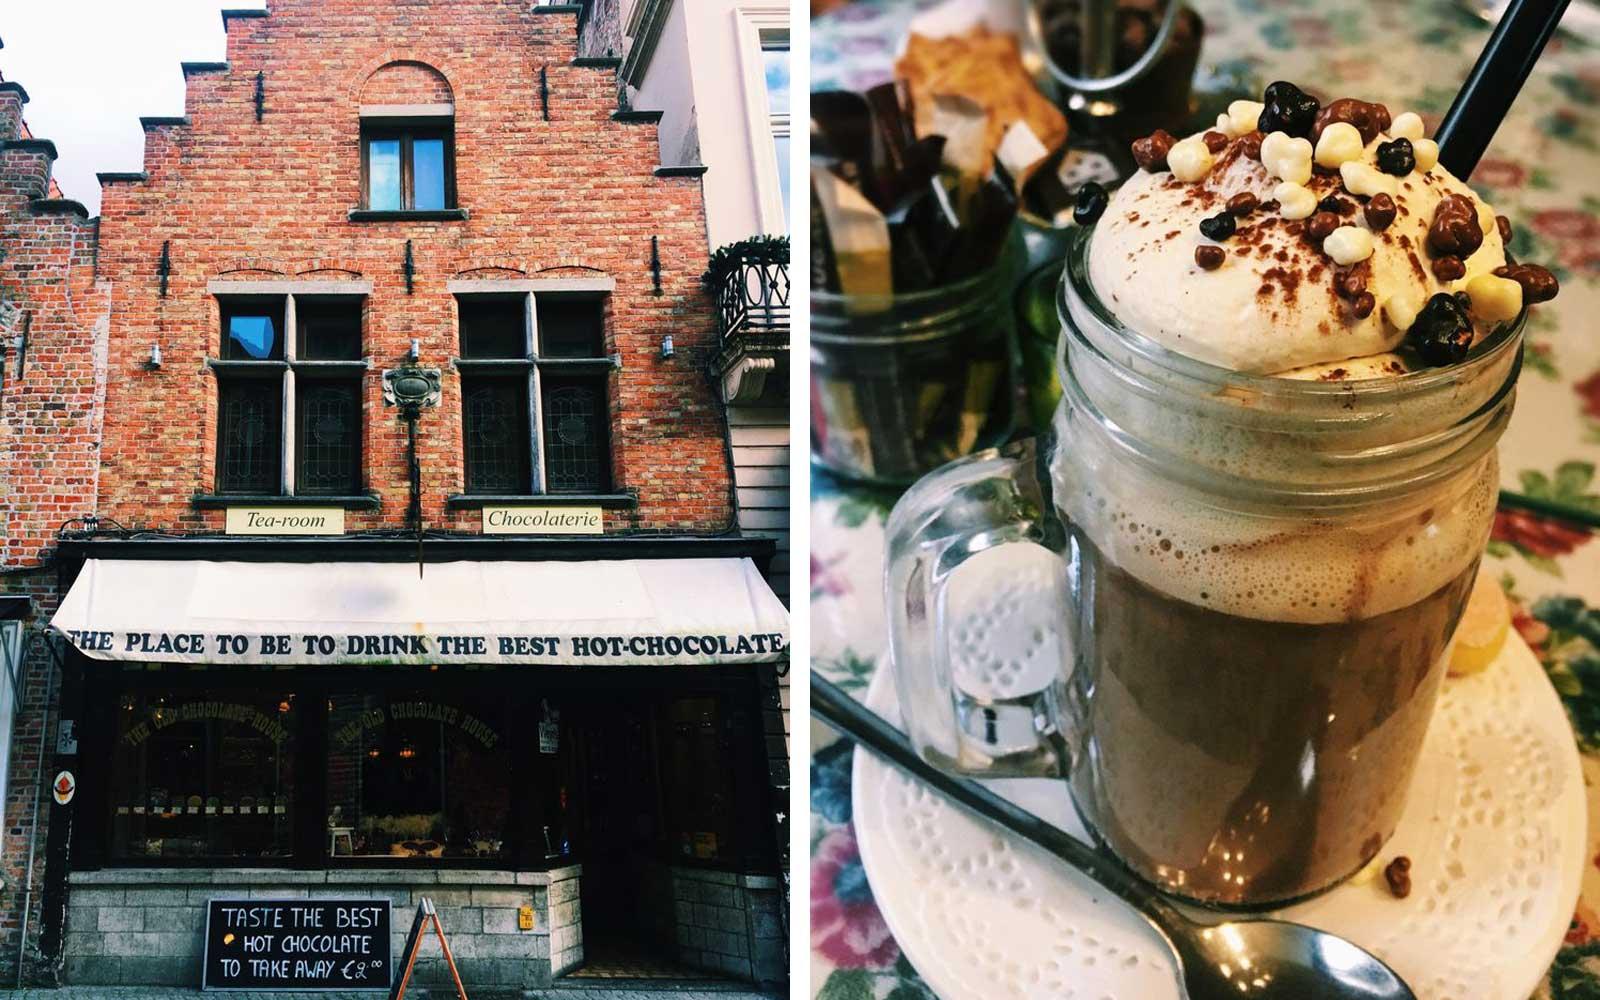 Best Hot Chocolate - Old Chocolate House, Belgium